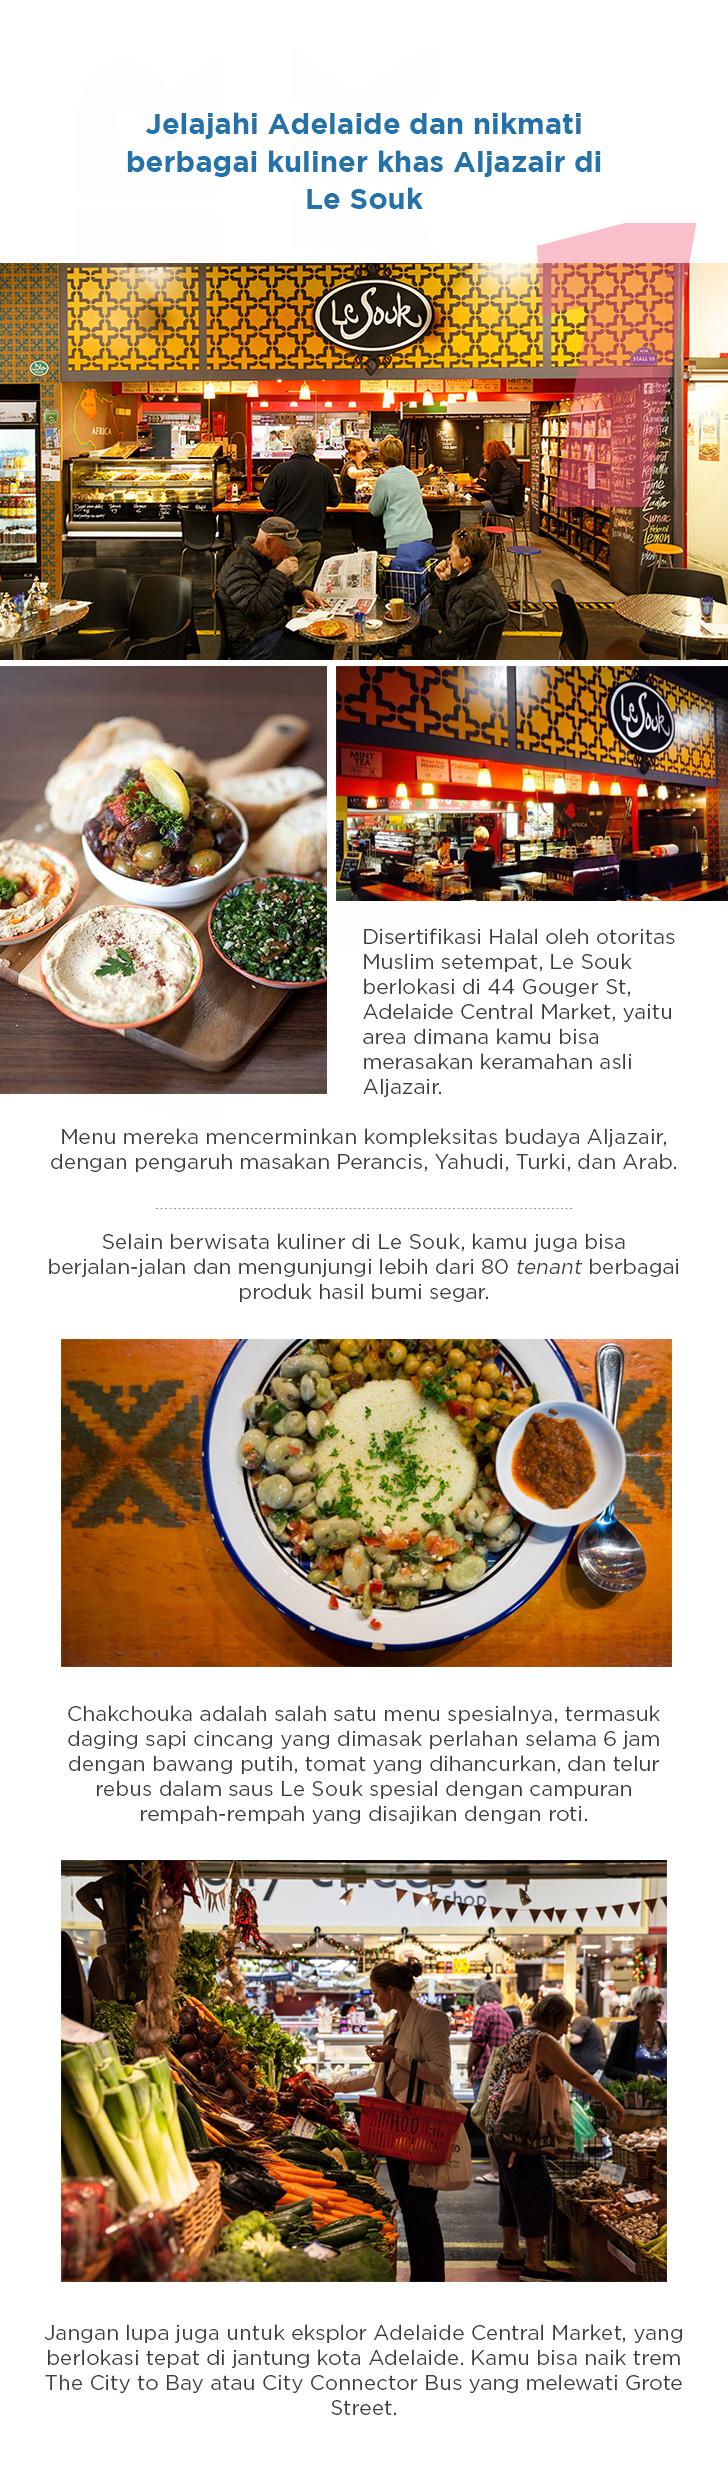 halal, infographic, kuliner, australia